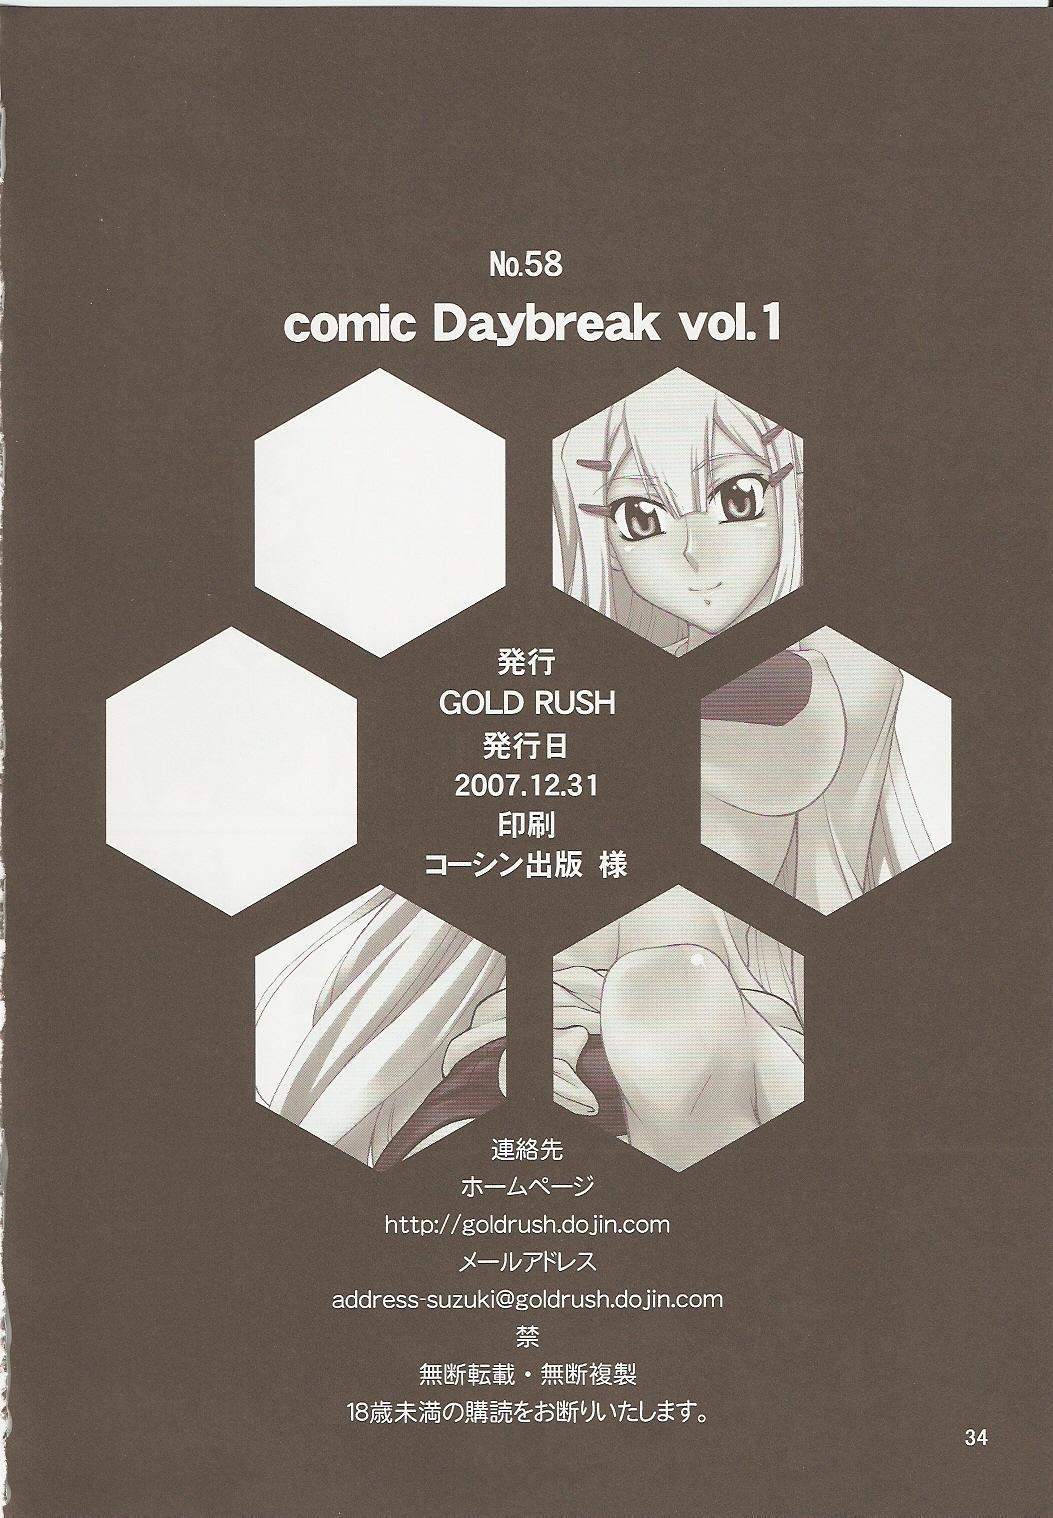 COMIC Daybreak Vol. 01 32